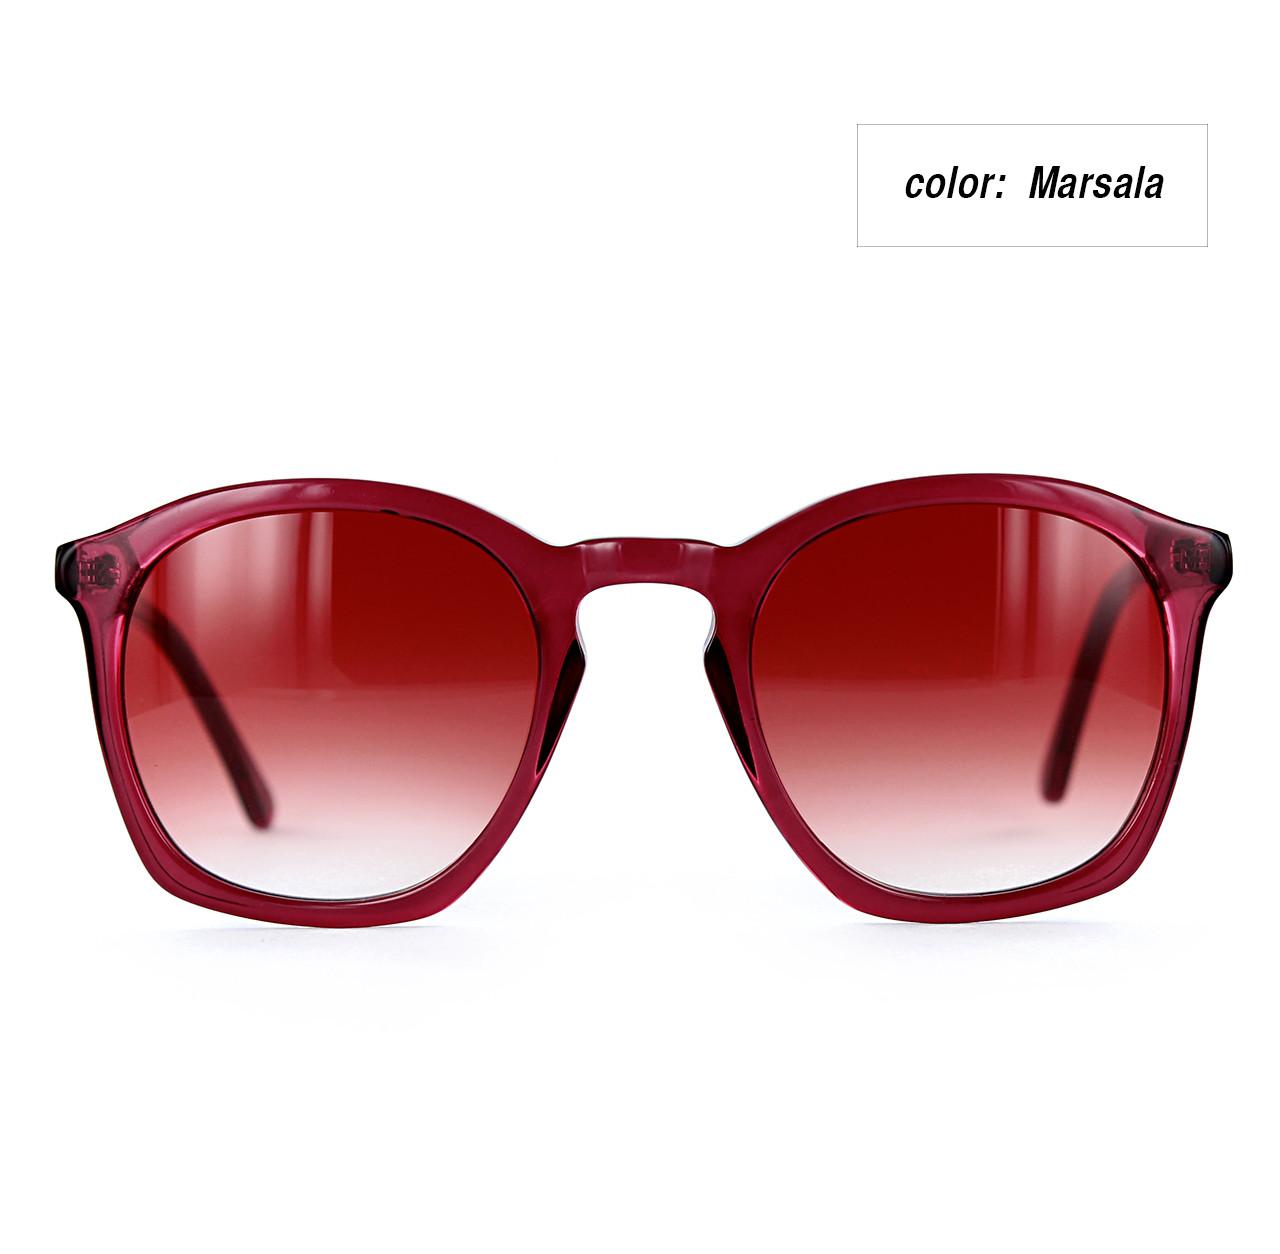 Rouq 4.0 Marsala with Gradient Marsala Lenses